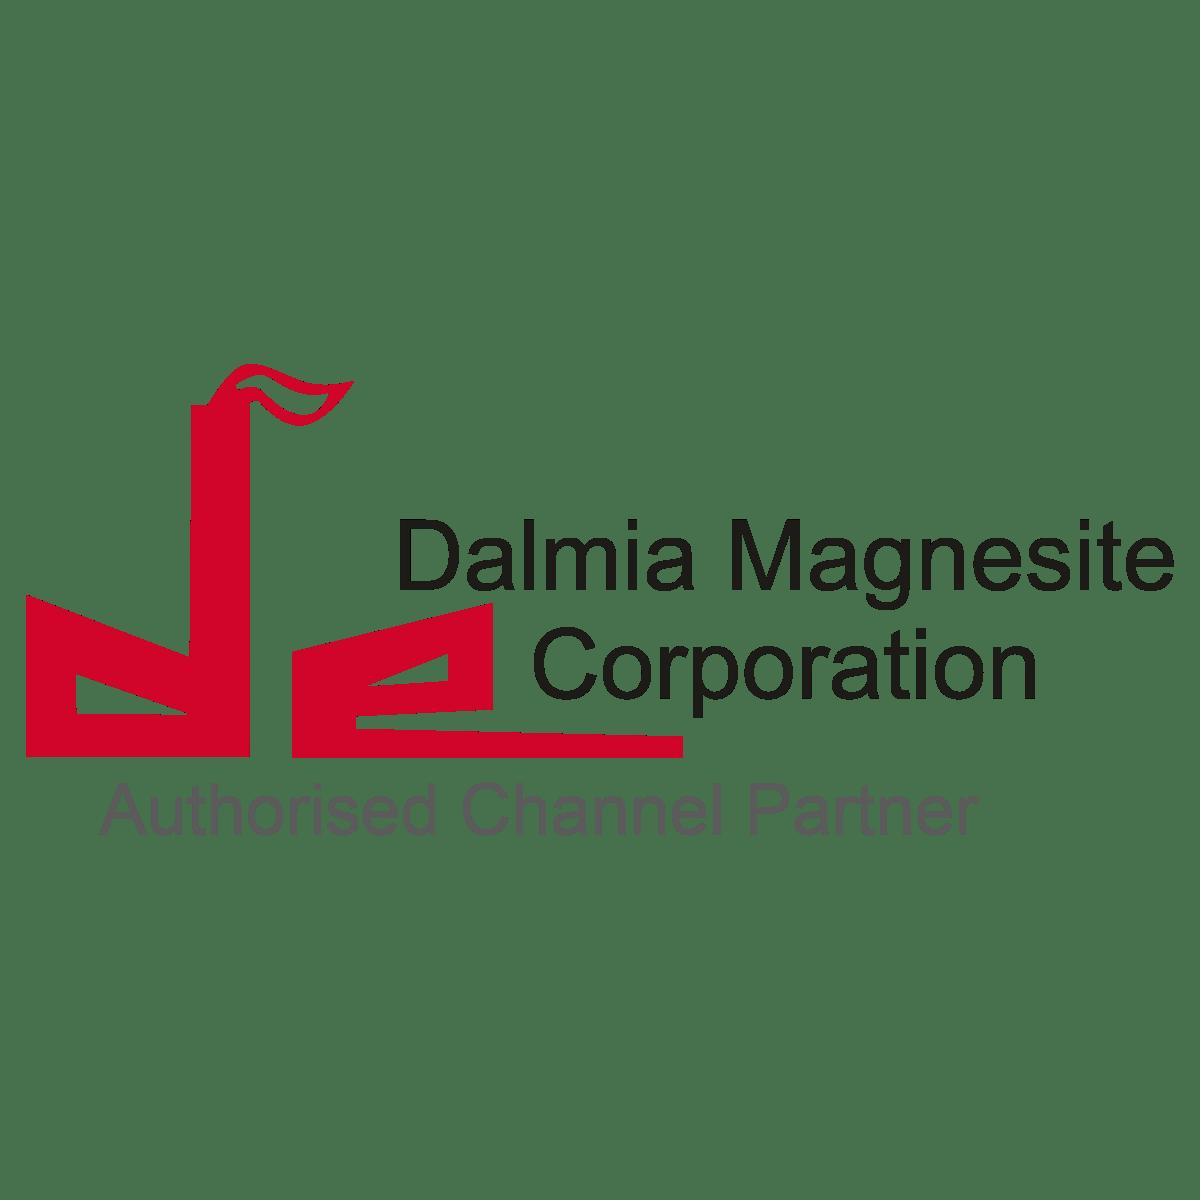 Dalmia Magnesite Corporation